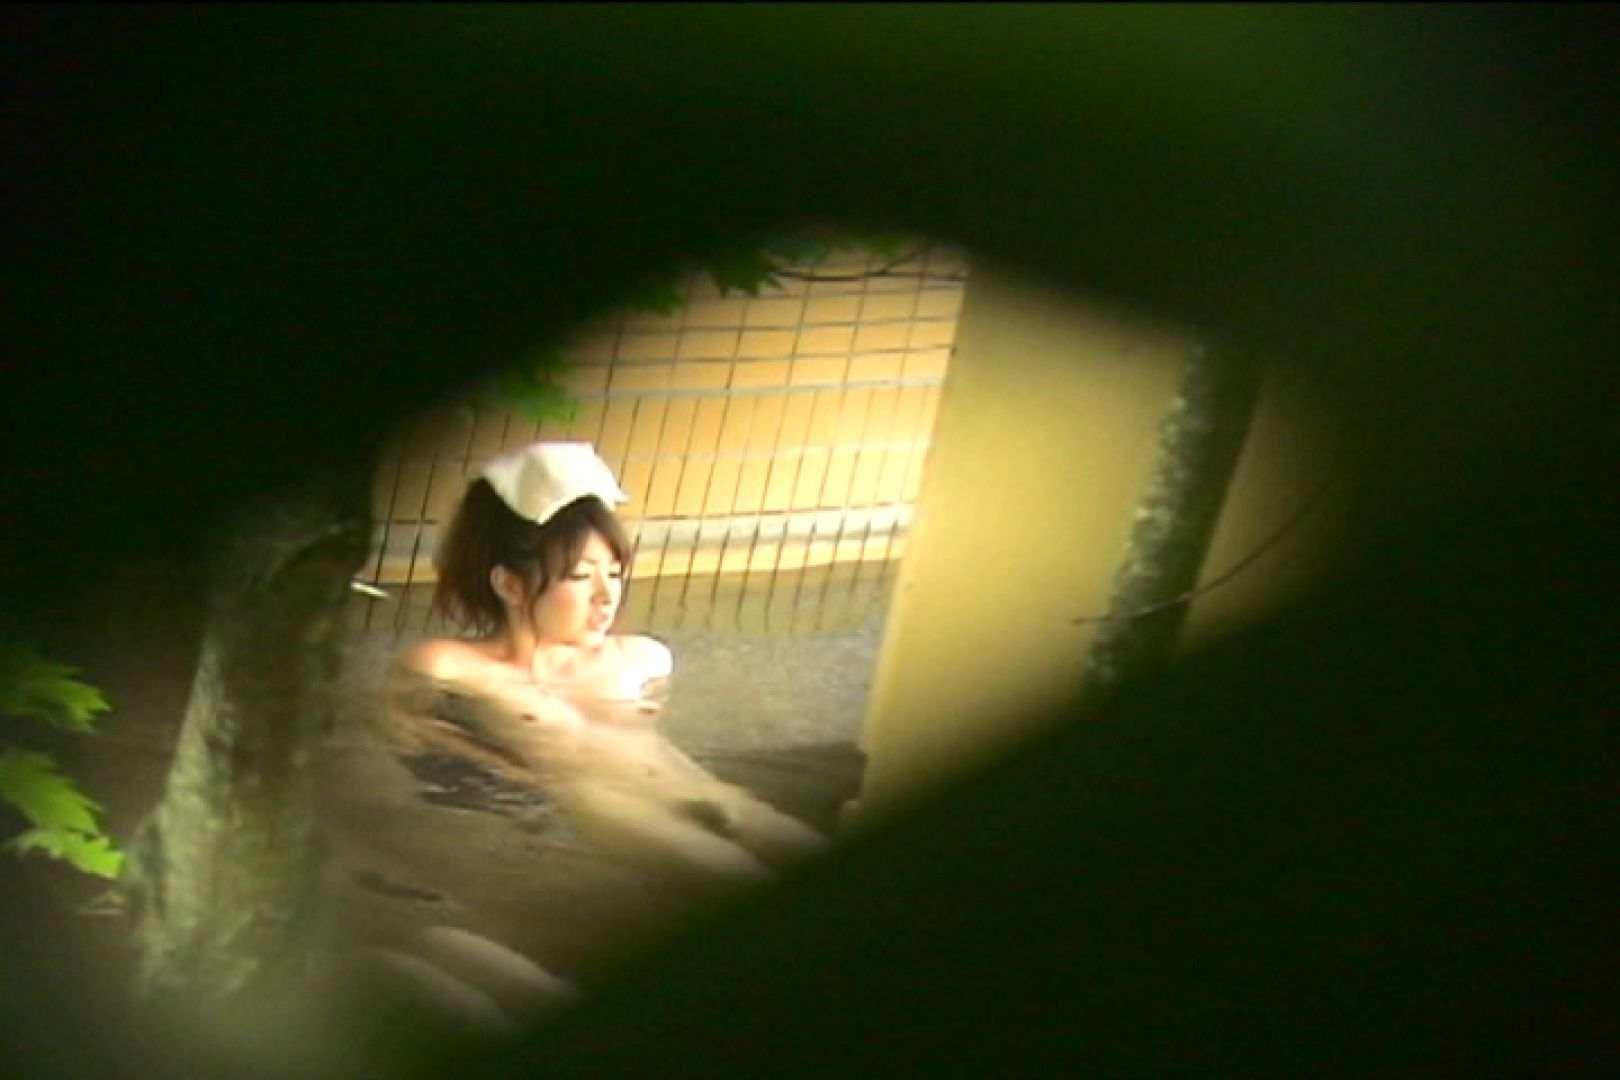 No.21 ほほを赤く染めた気の強そうなギャル おkaさんと ギャル盗撮映像 | 盗撮  61PIX 1